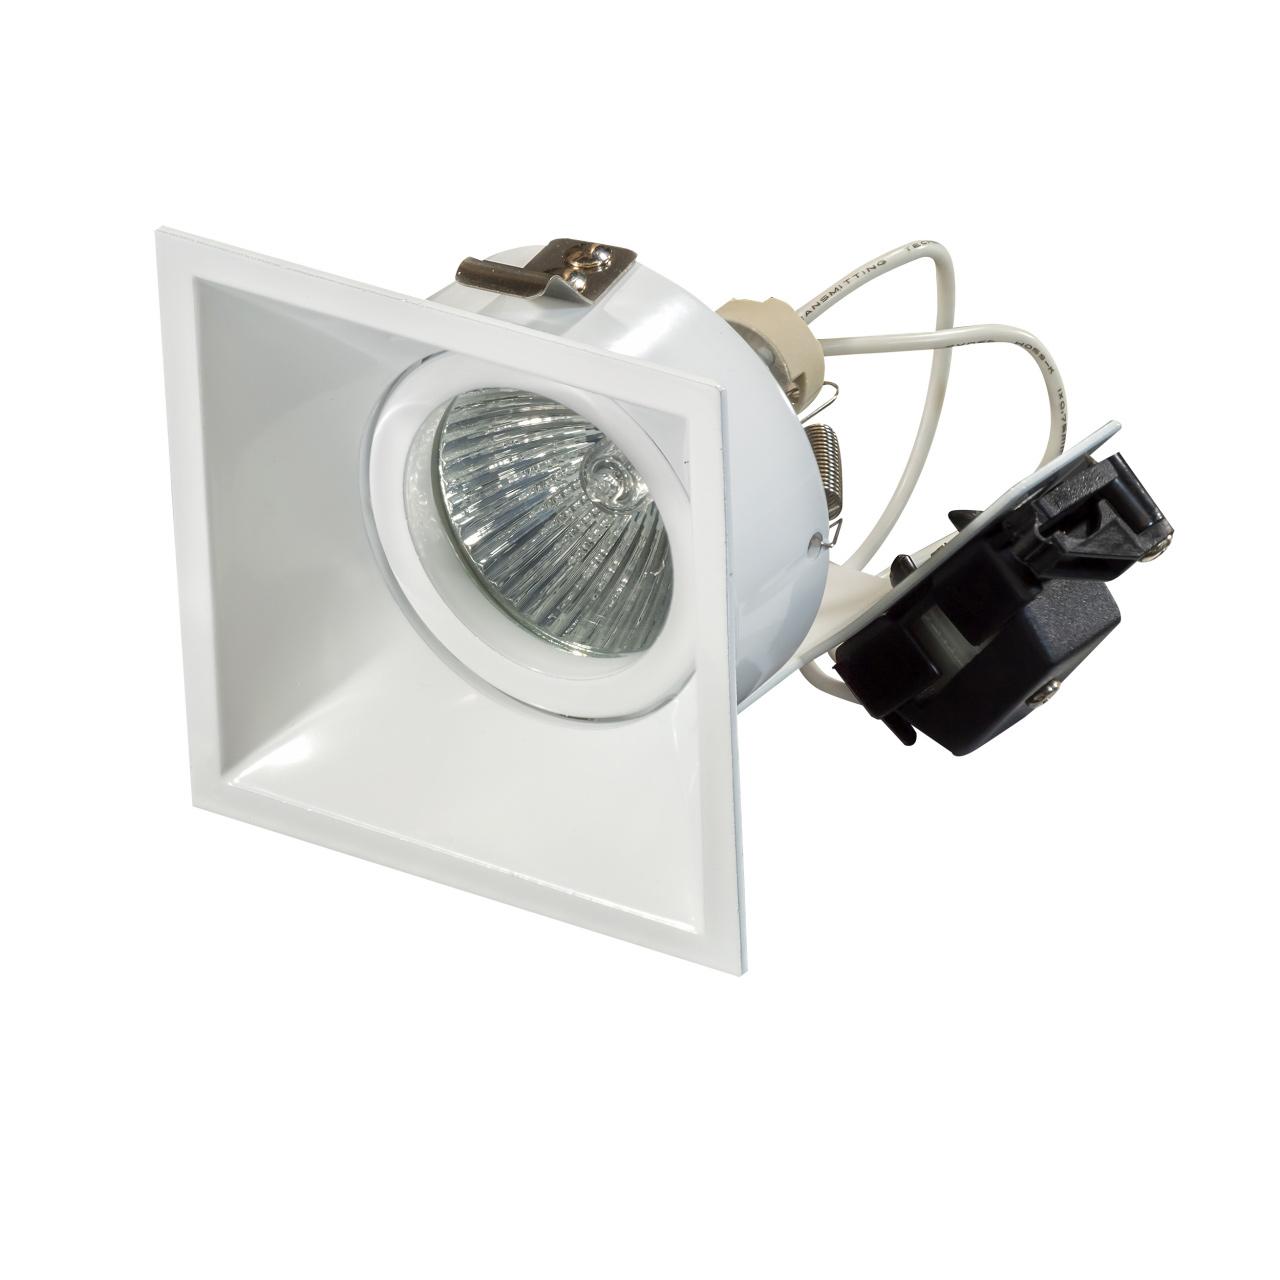 Светильник Domino quadro MR16 белый Lightstar 214506